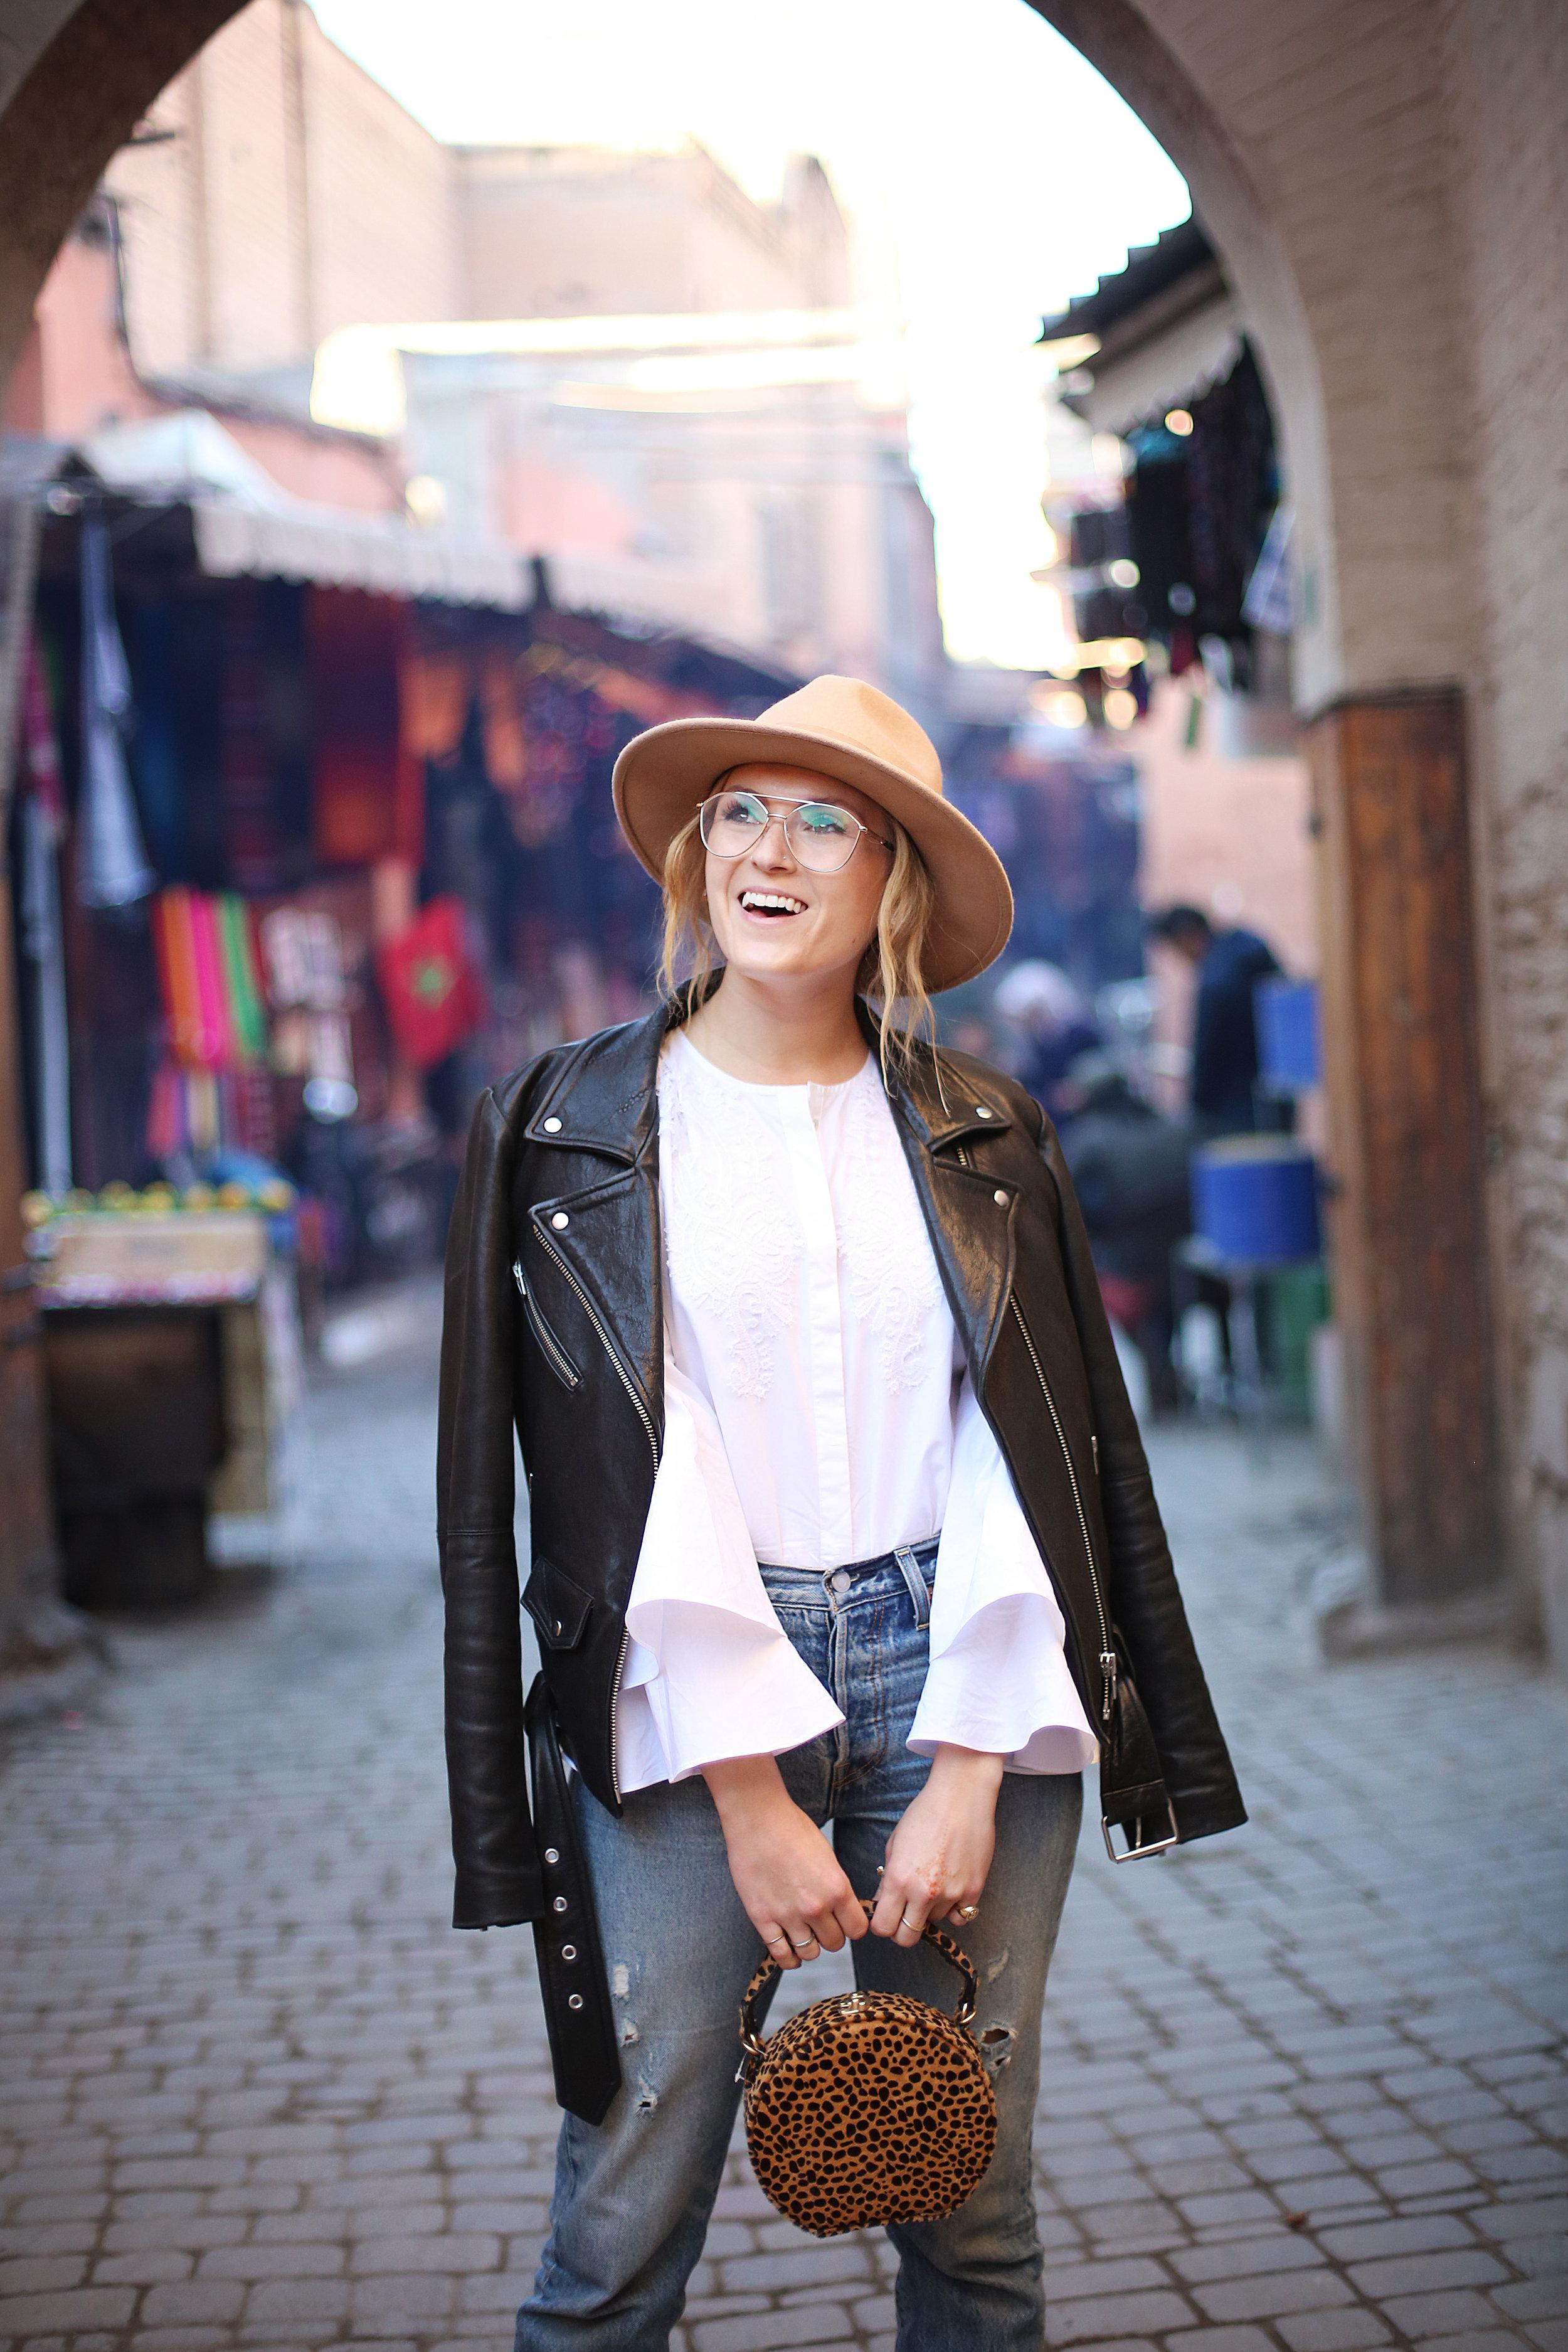 Jacket:  Veda , Blouse:  Kobi Halperin , Jeans:  Levi's , Clutch:  Anthropologie , Glasses:  Zyloware , Hat:  Alice and Wonder